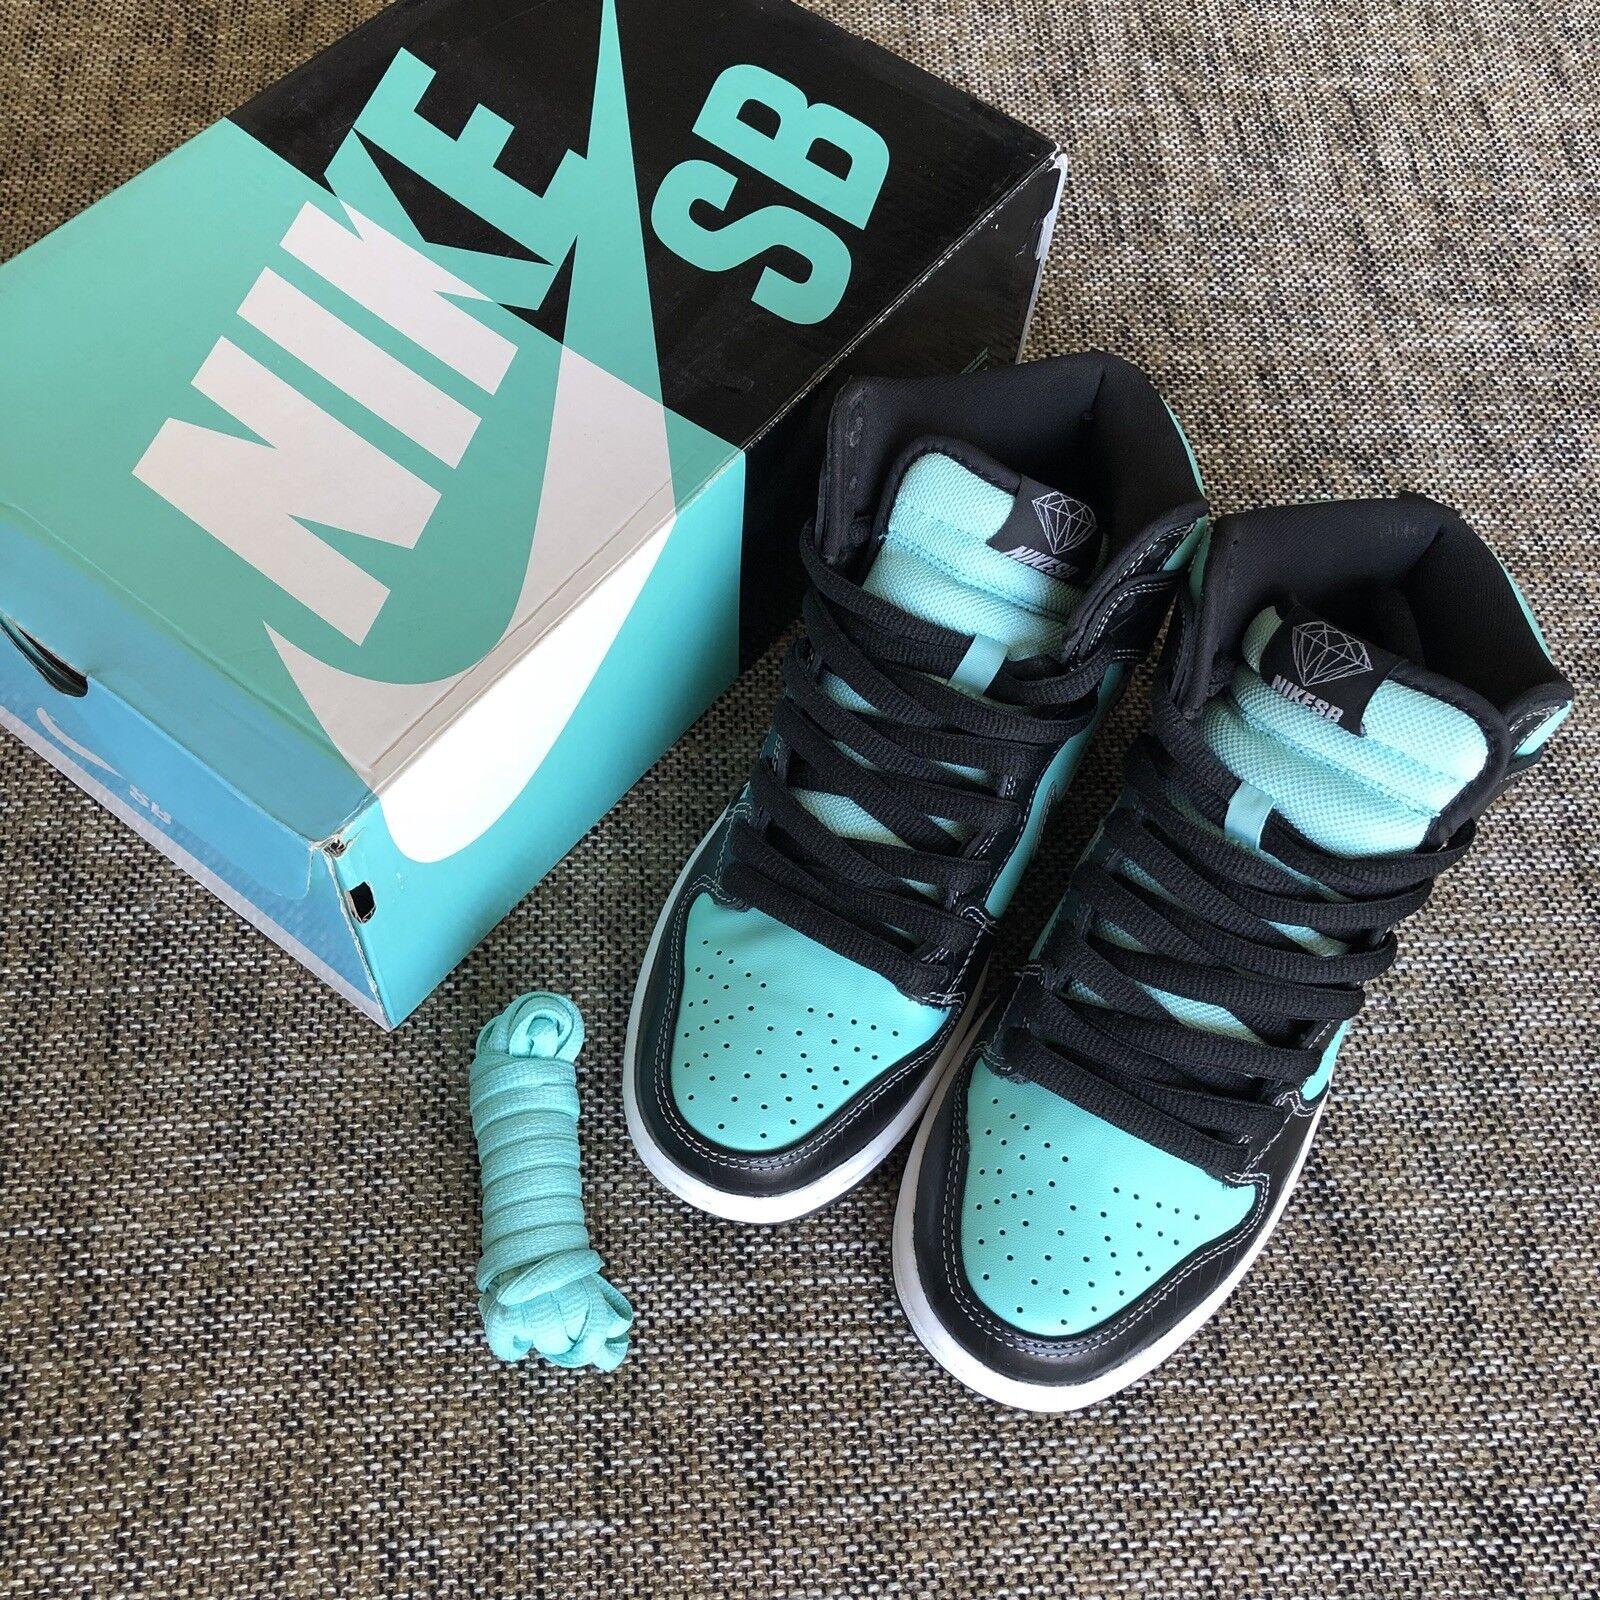 Nike SB Supply Dunk alto x Diamond Supply SB comodo Wild Casual Shoes c4f974